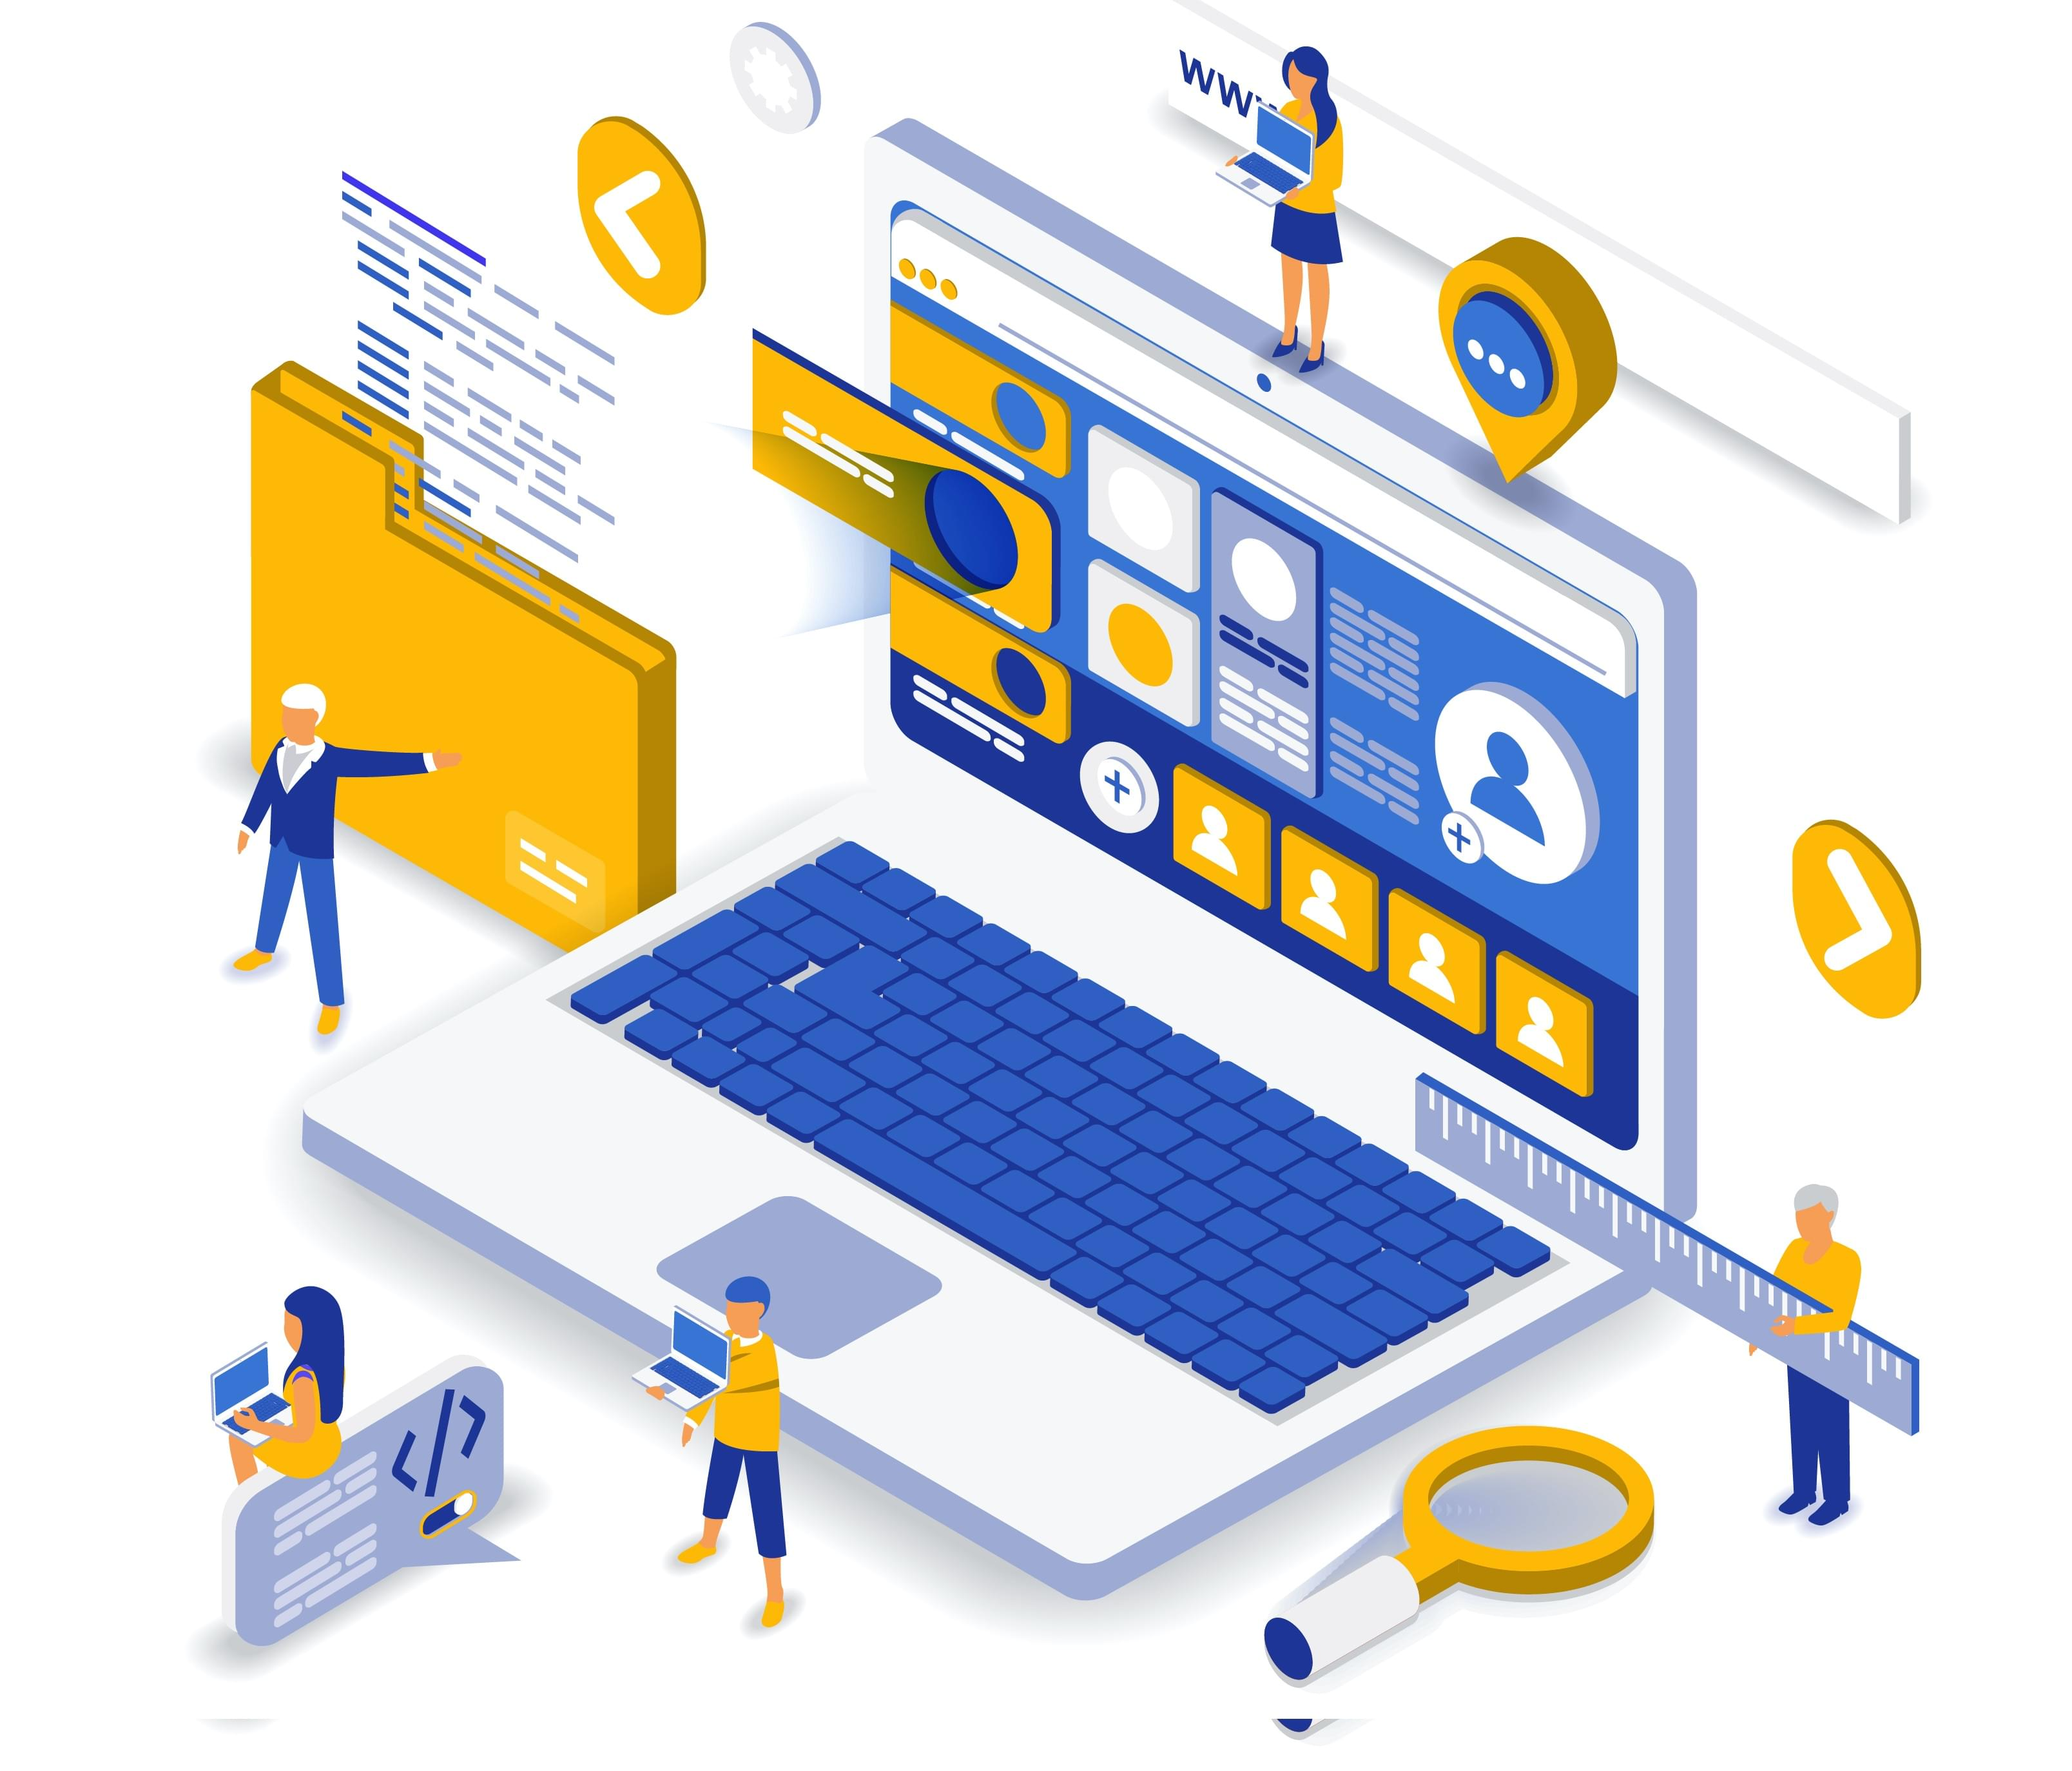 10 Zsh Tips & Tricks: Configuration, Customization & Usage - SitePoint